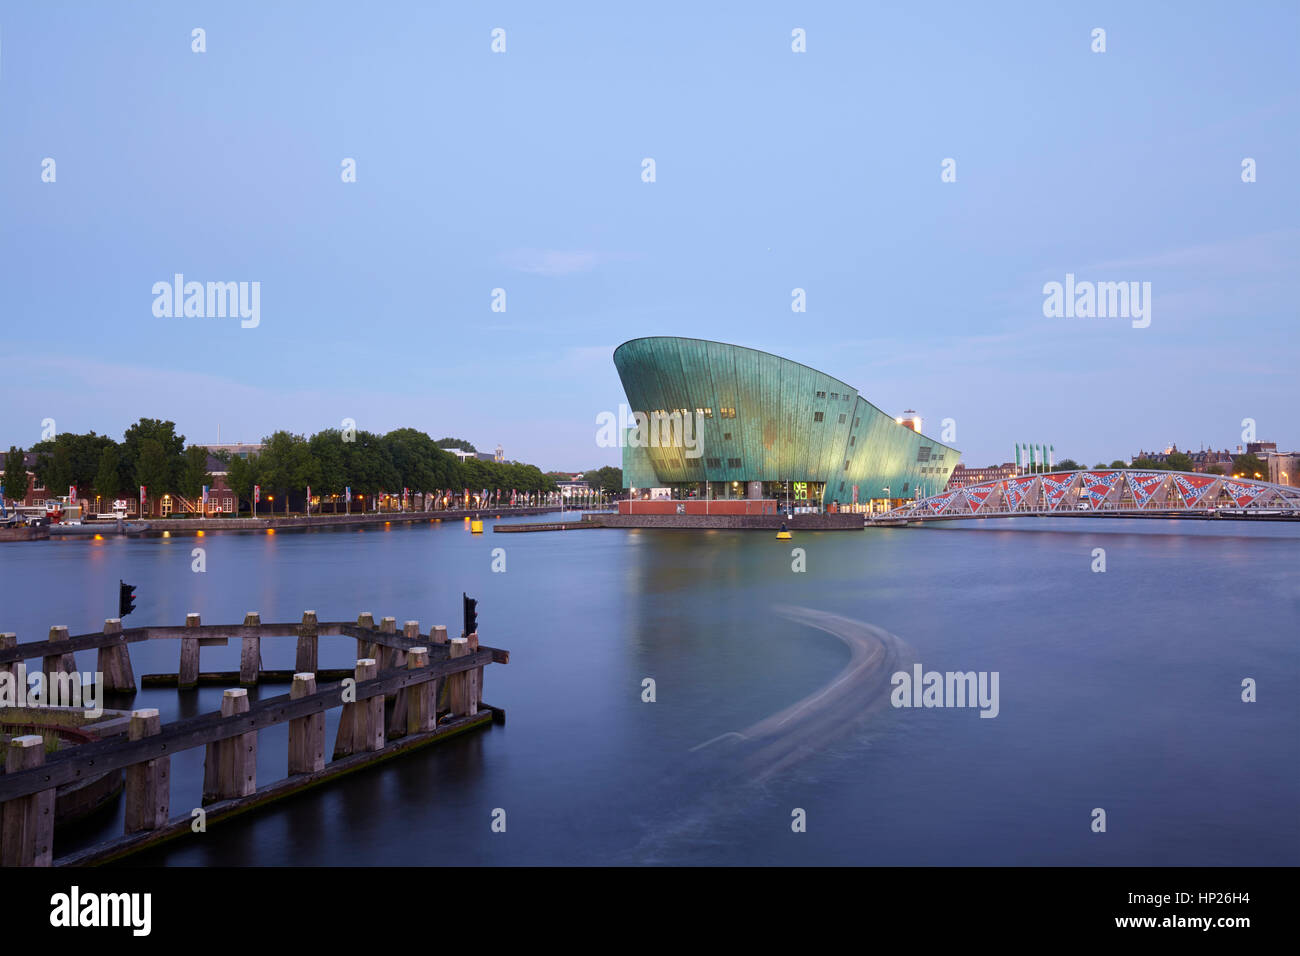 NEMO Science Museum in Amsterdam, Netherlands - Stock Image